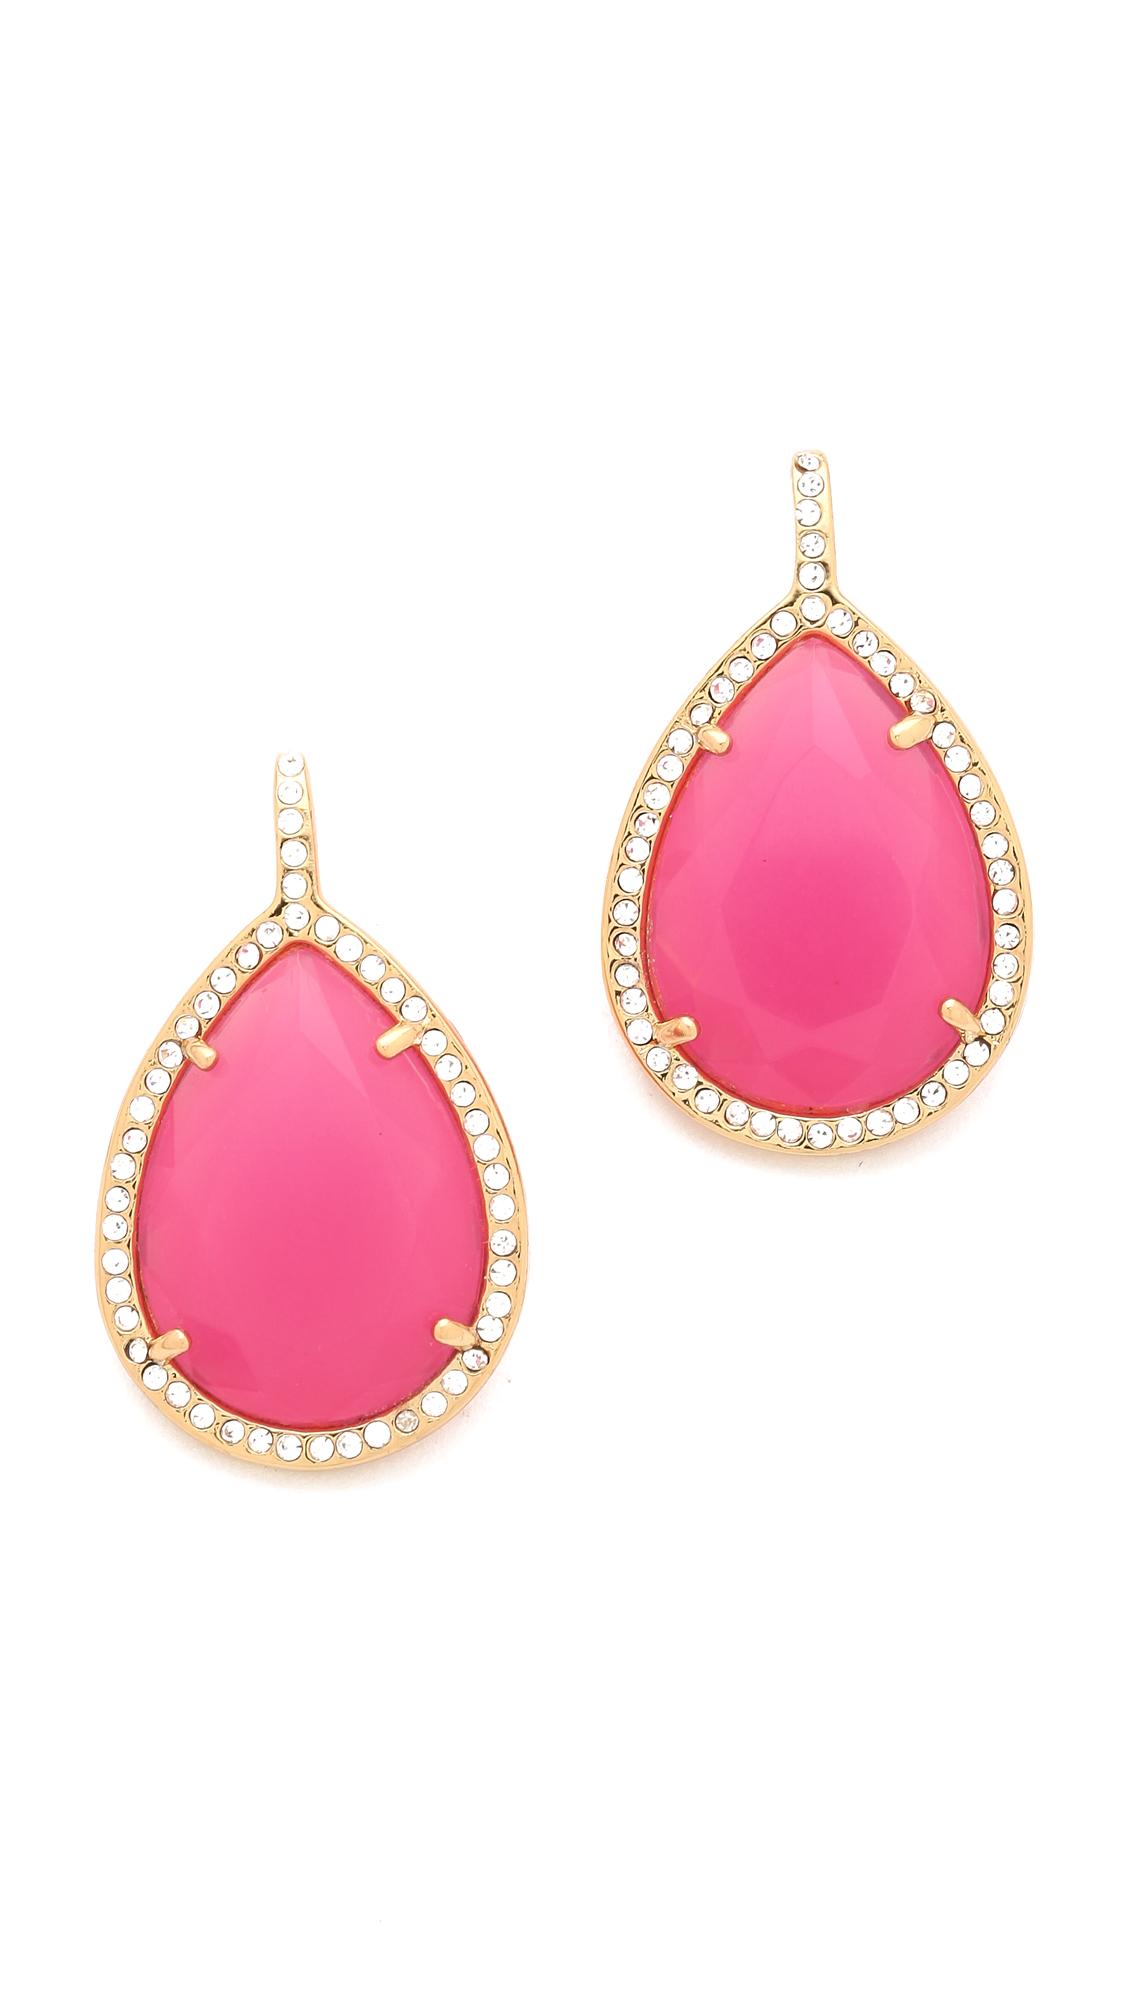 juicy couture pave teardrop earrings in pink raspberry. Black Bedroom Furniture Sets. Home Design Ideas